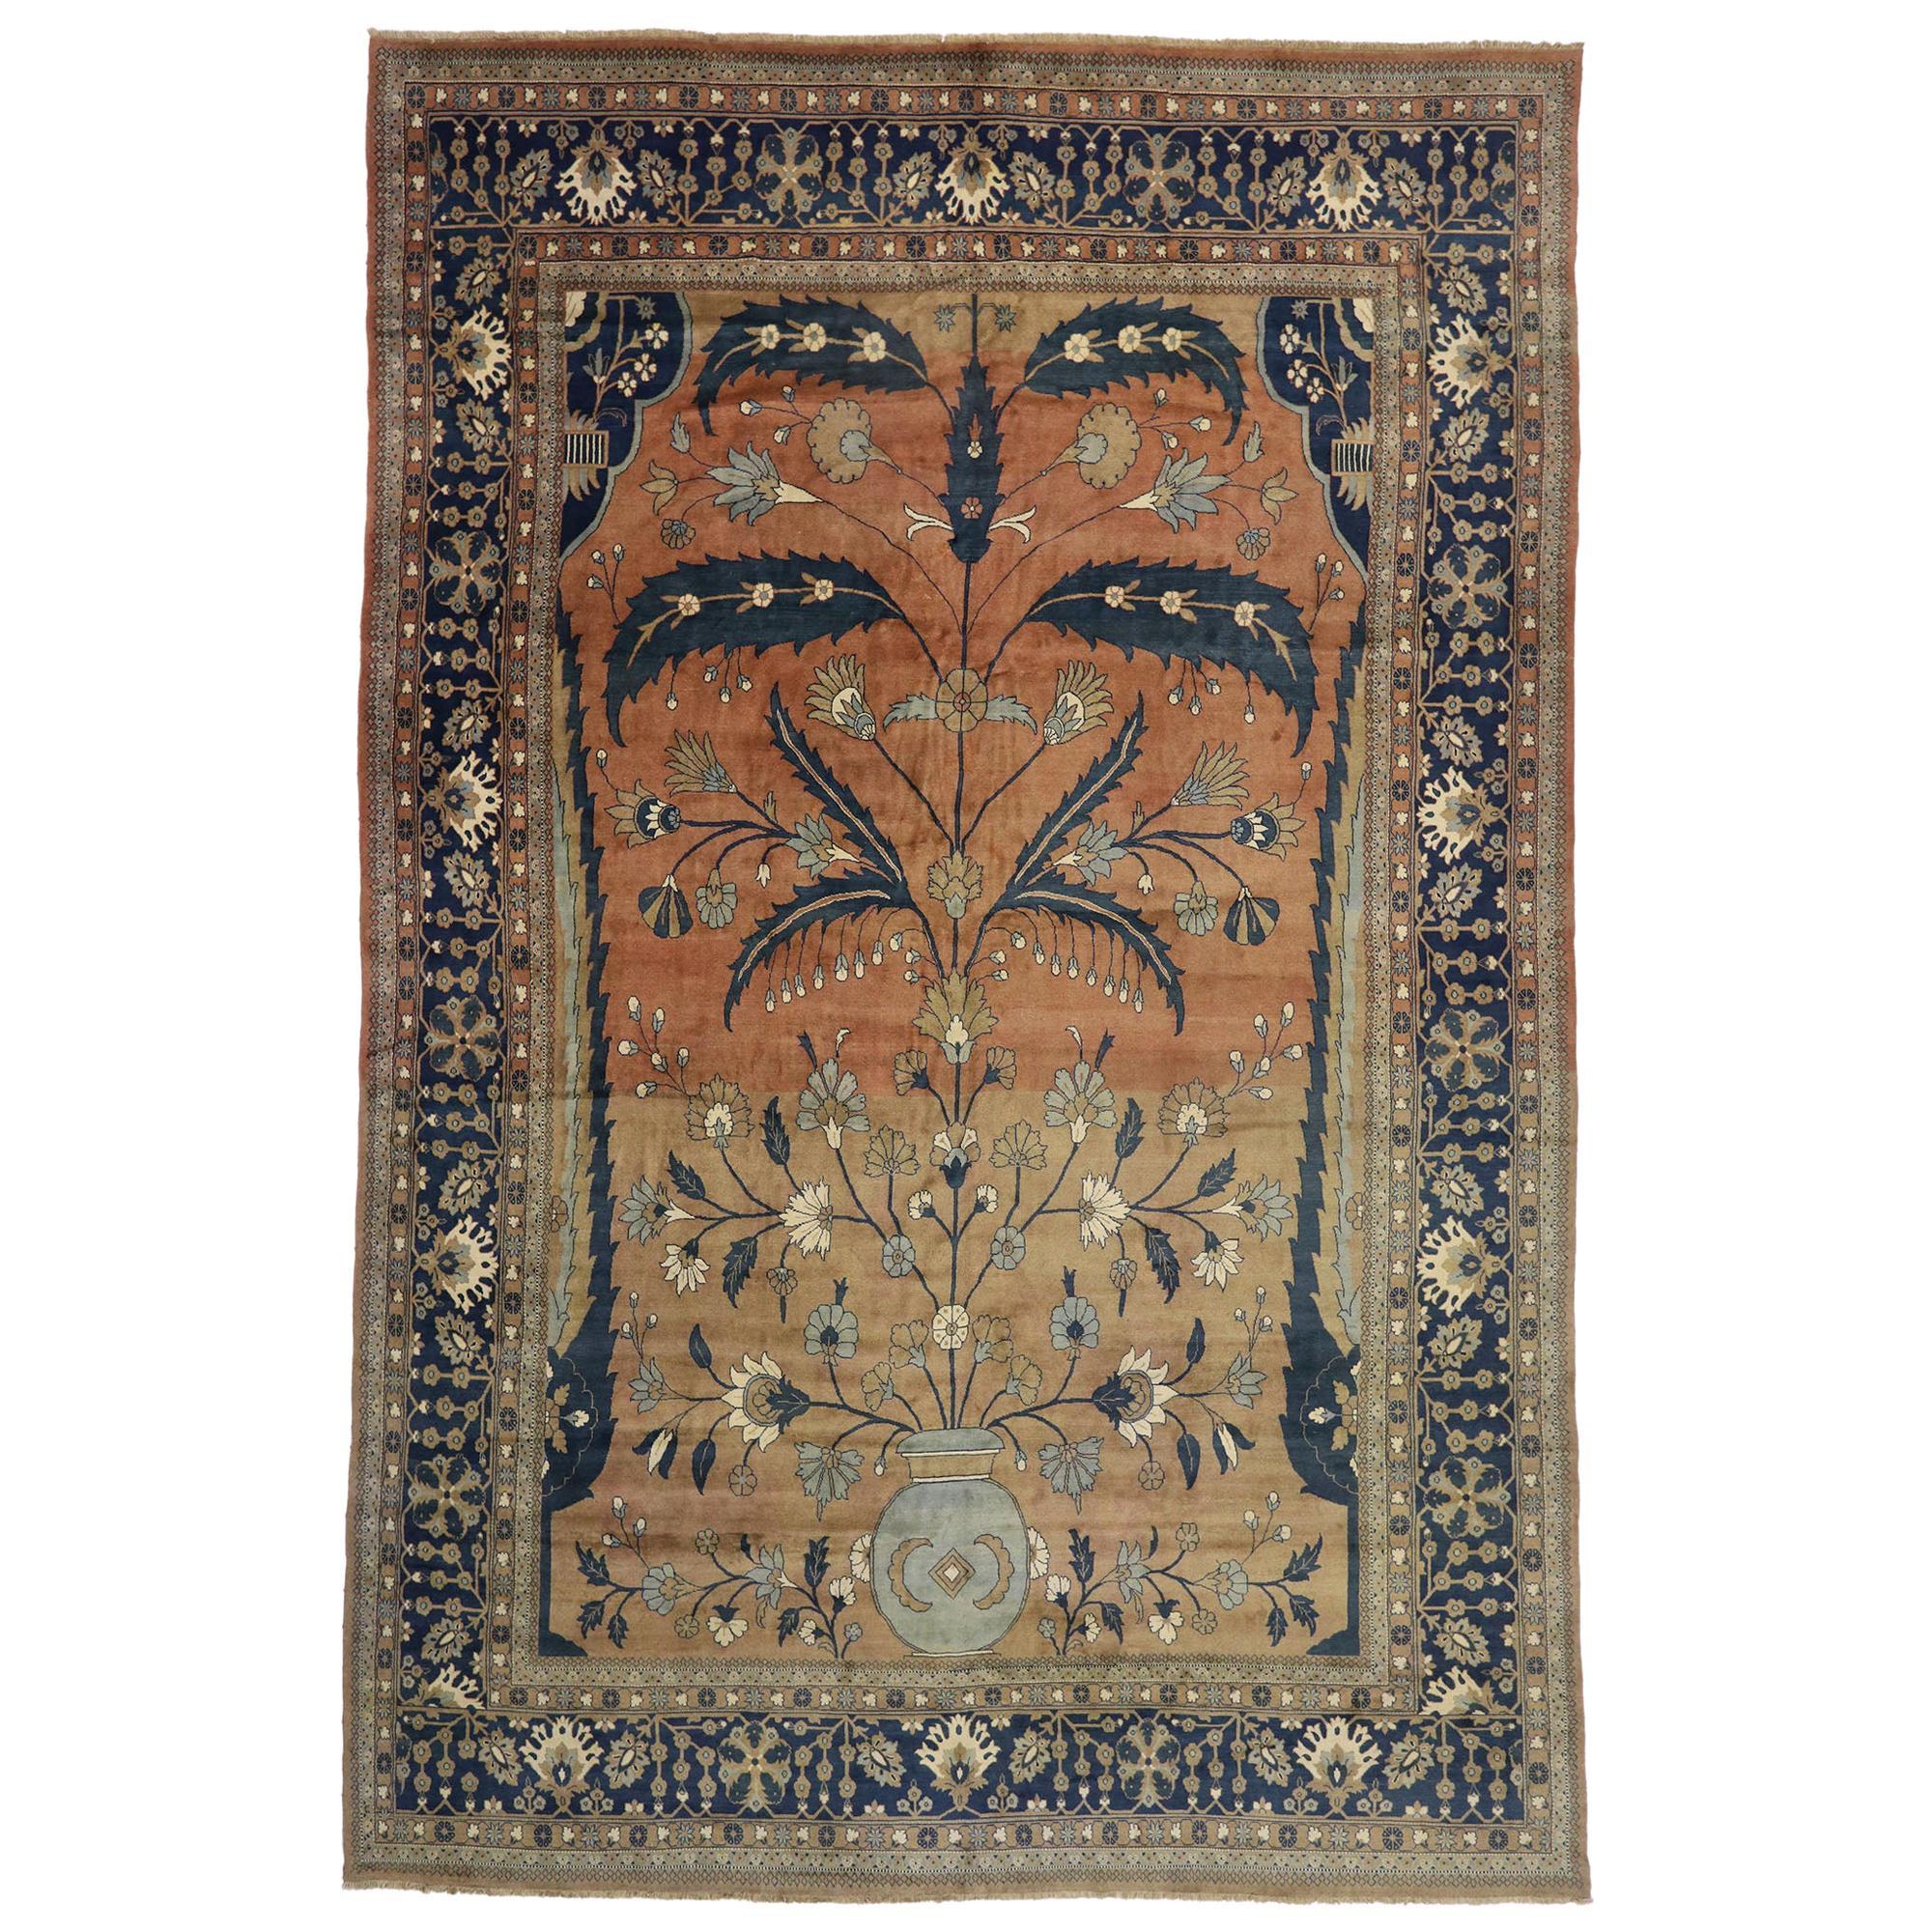 Vintage Persian Mahal Rug with Rustic Mediterranean Italian Style